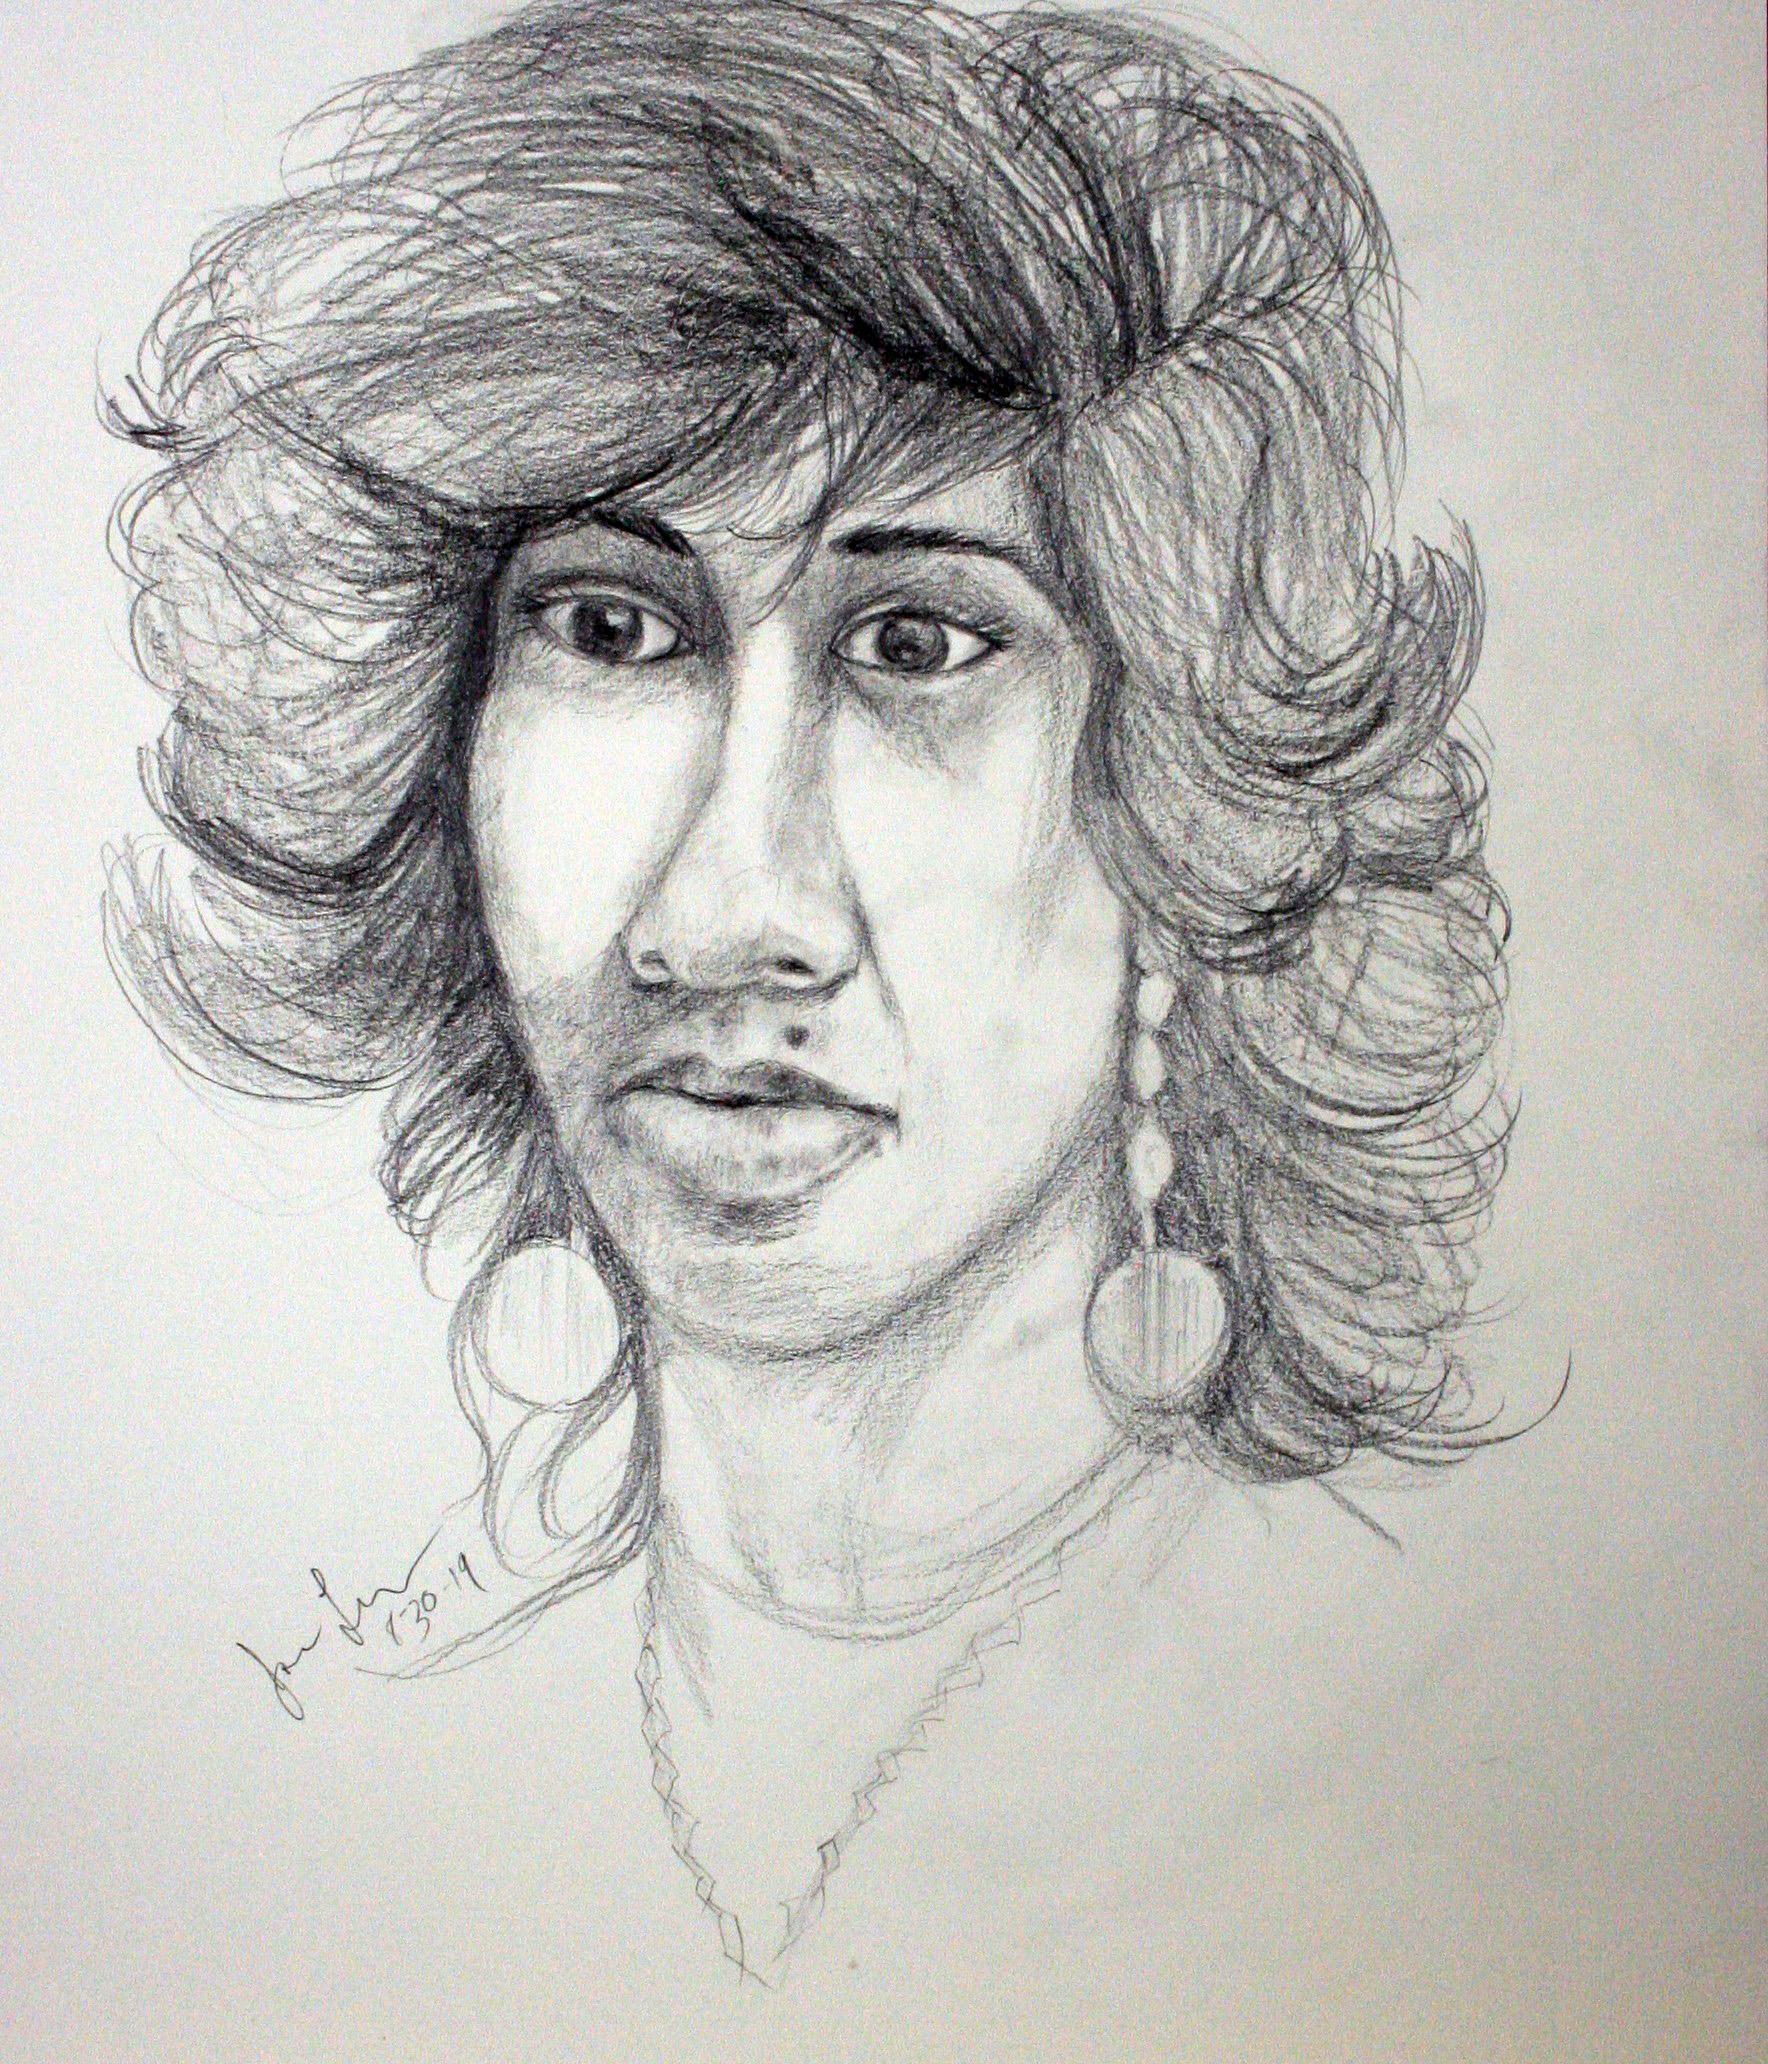 James Lupica - Pencil